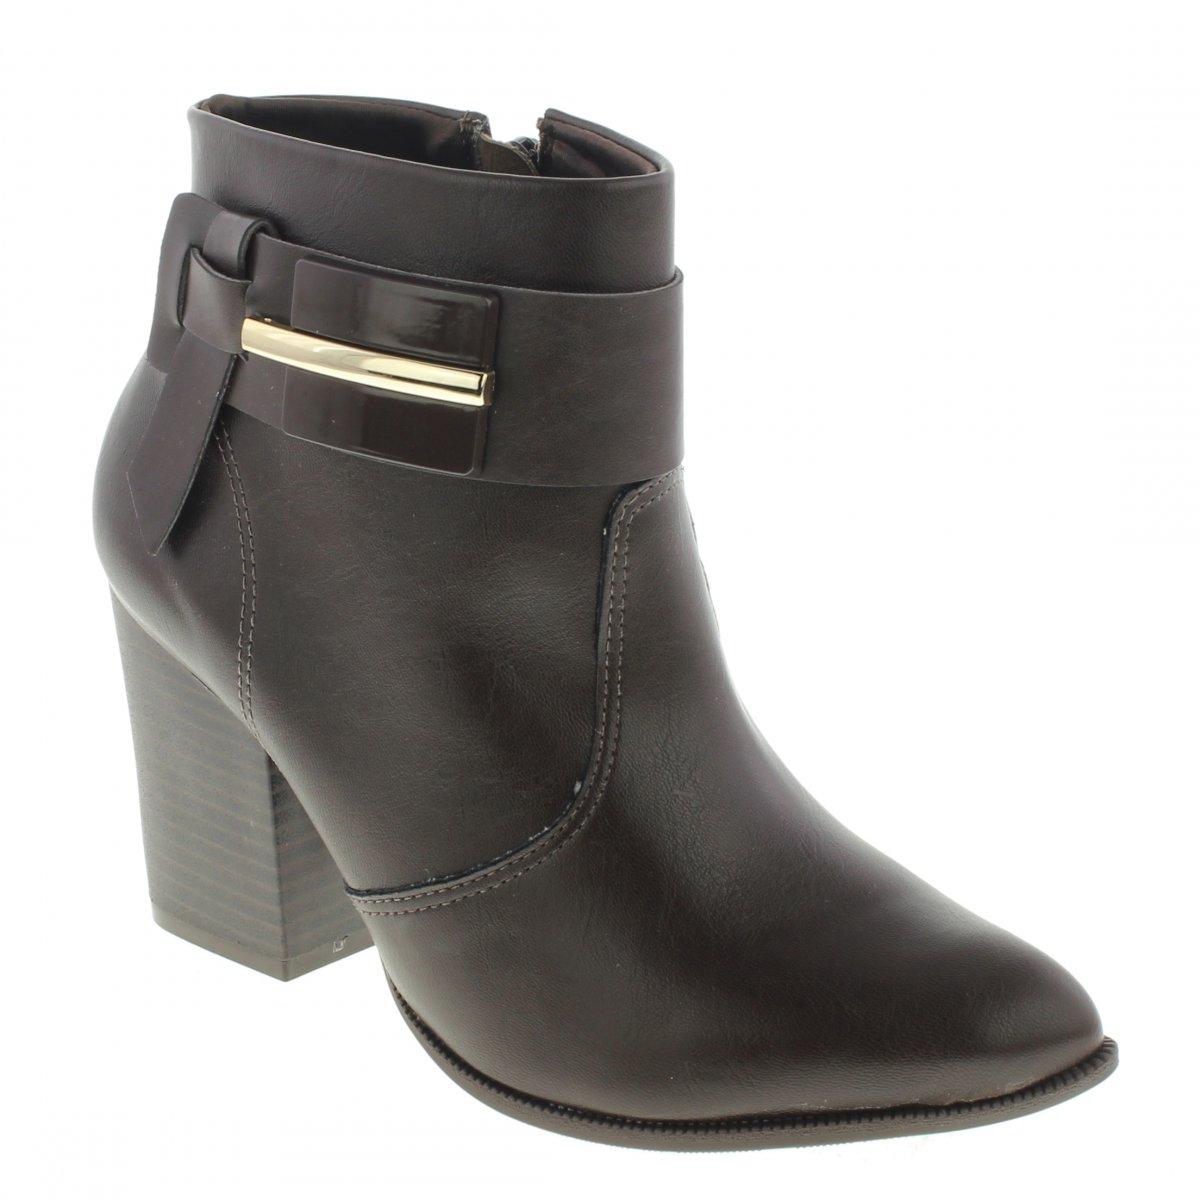 9f067d3059 Bota Ramarim 1816103 Ankle Boot